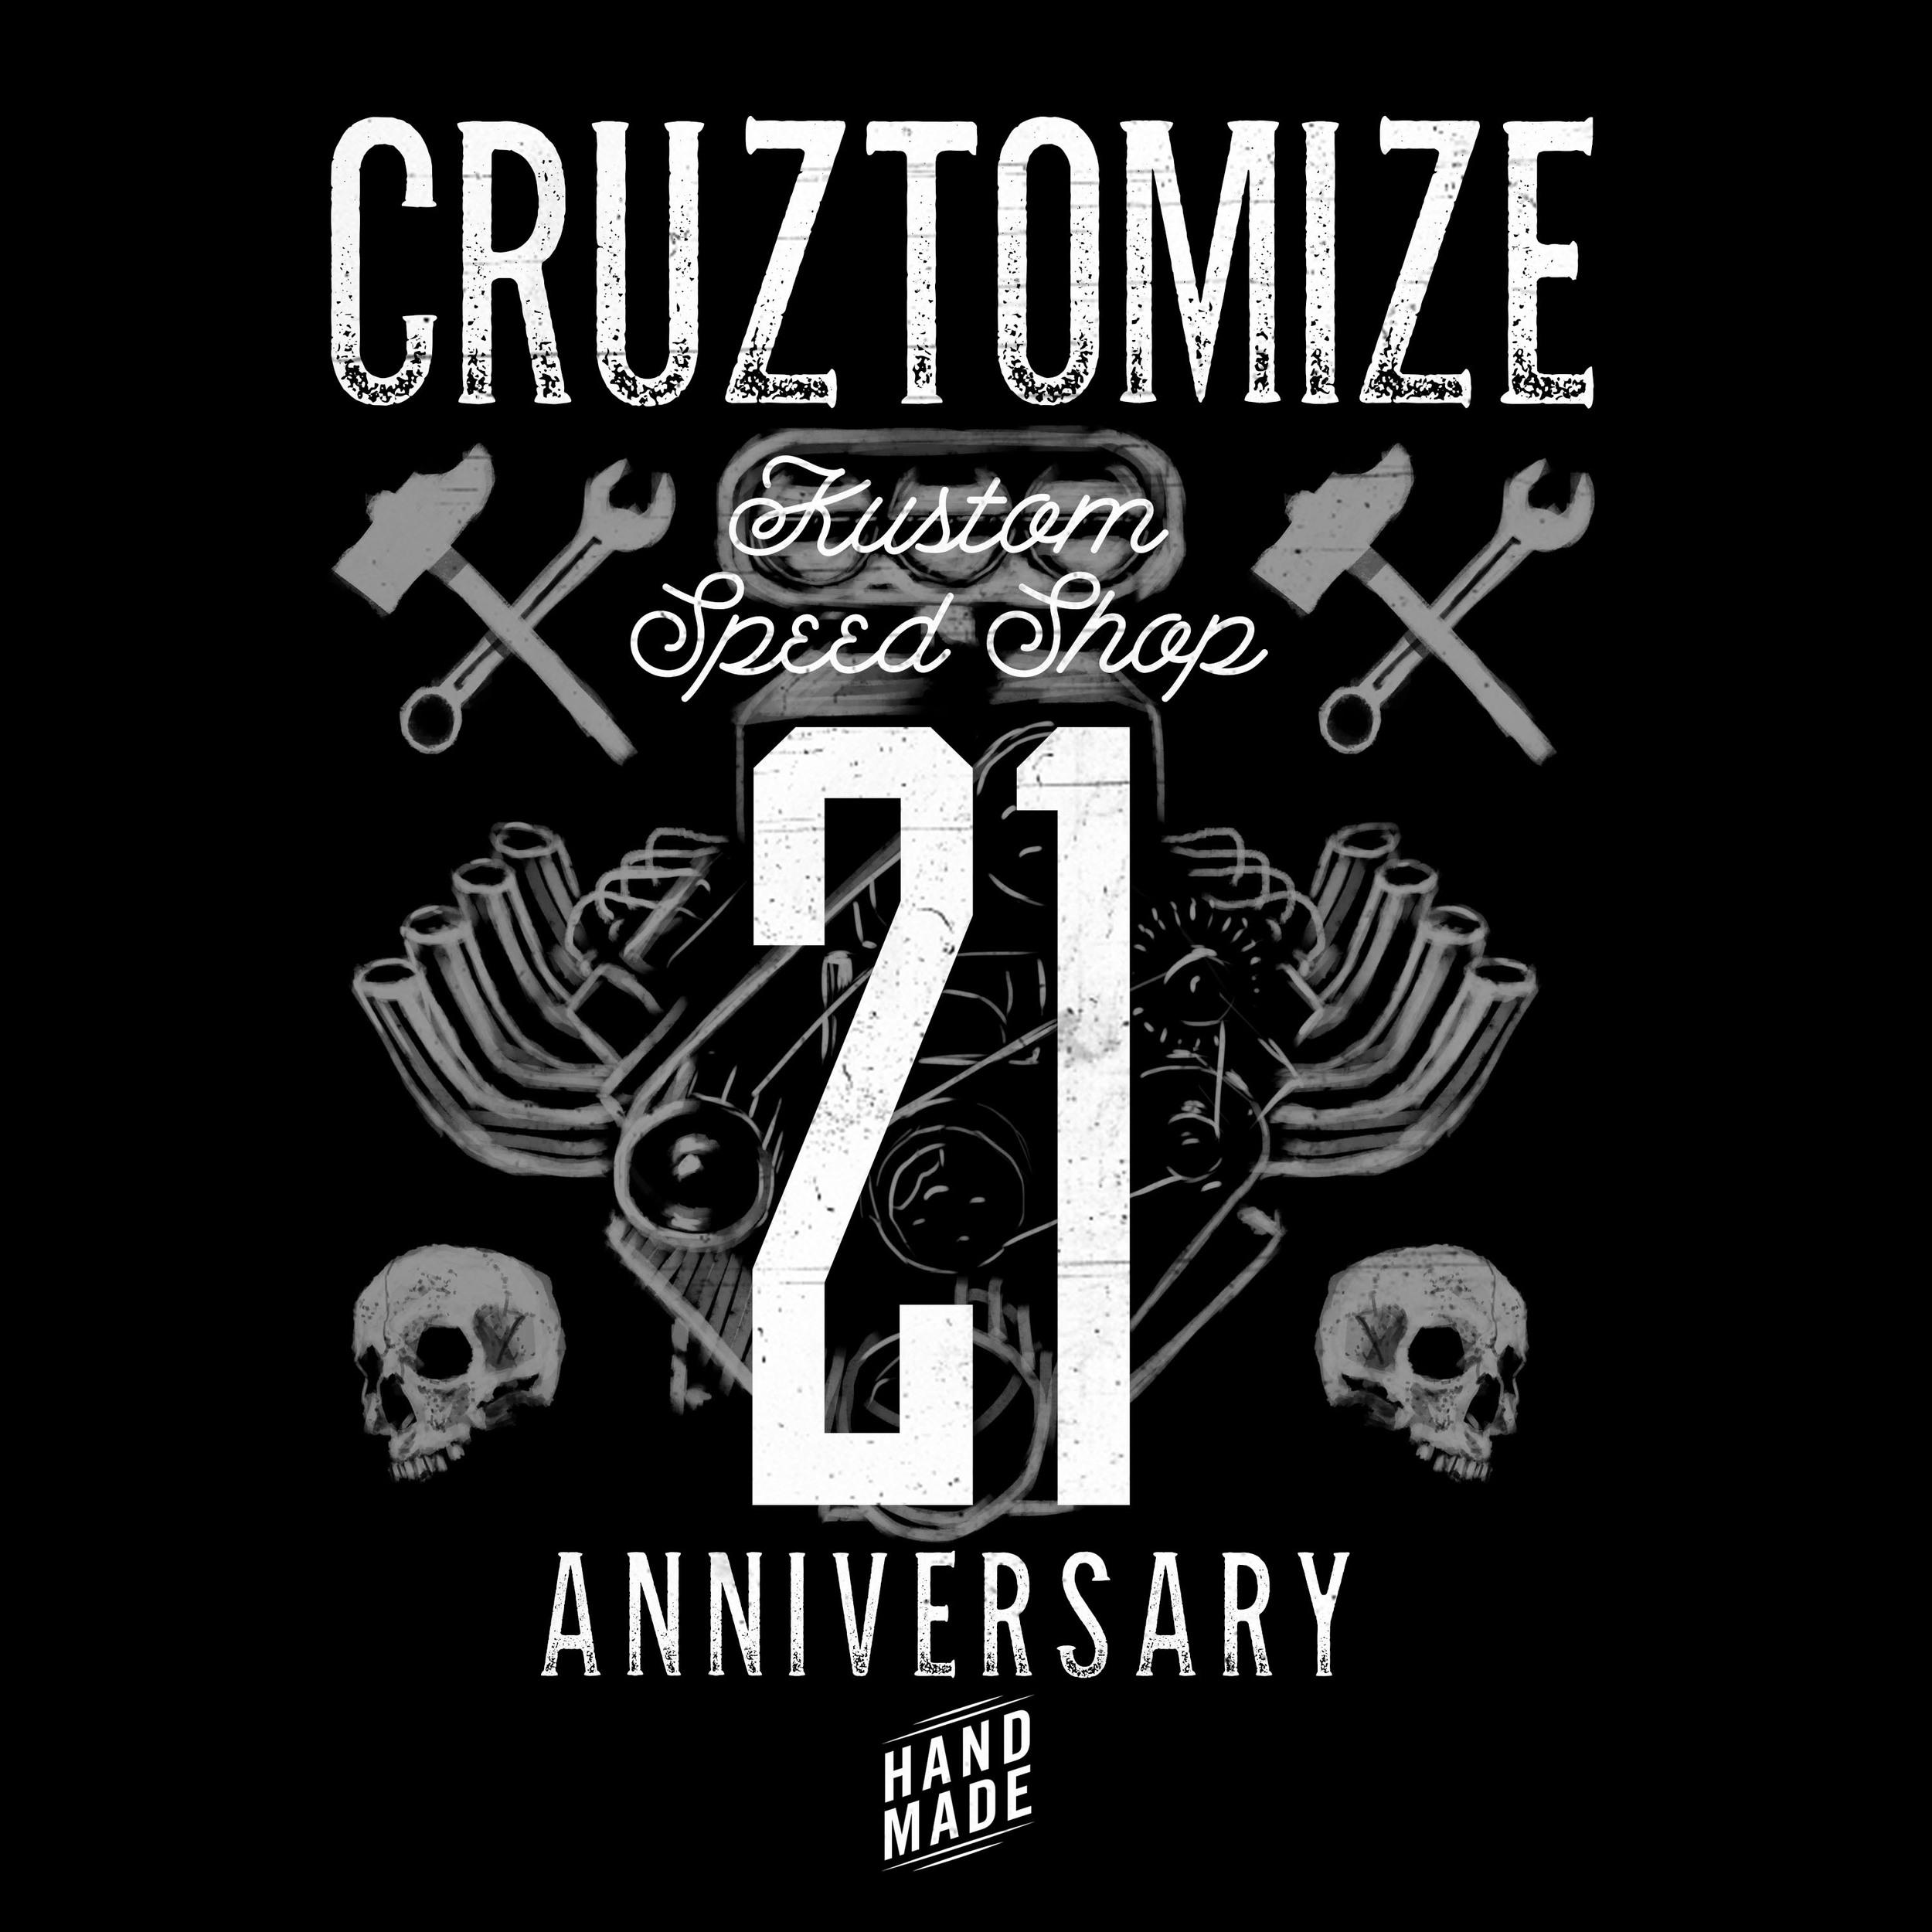 21 Anniversary Poster/Shirt Design